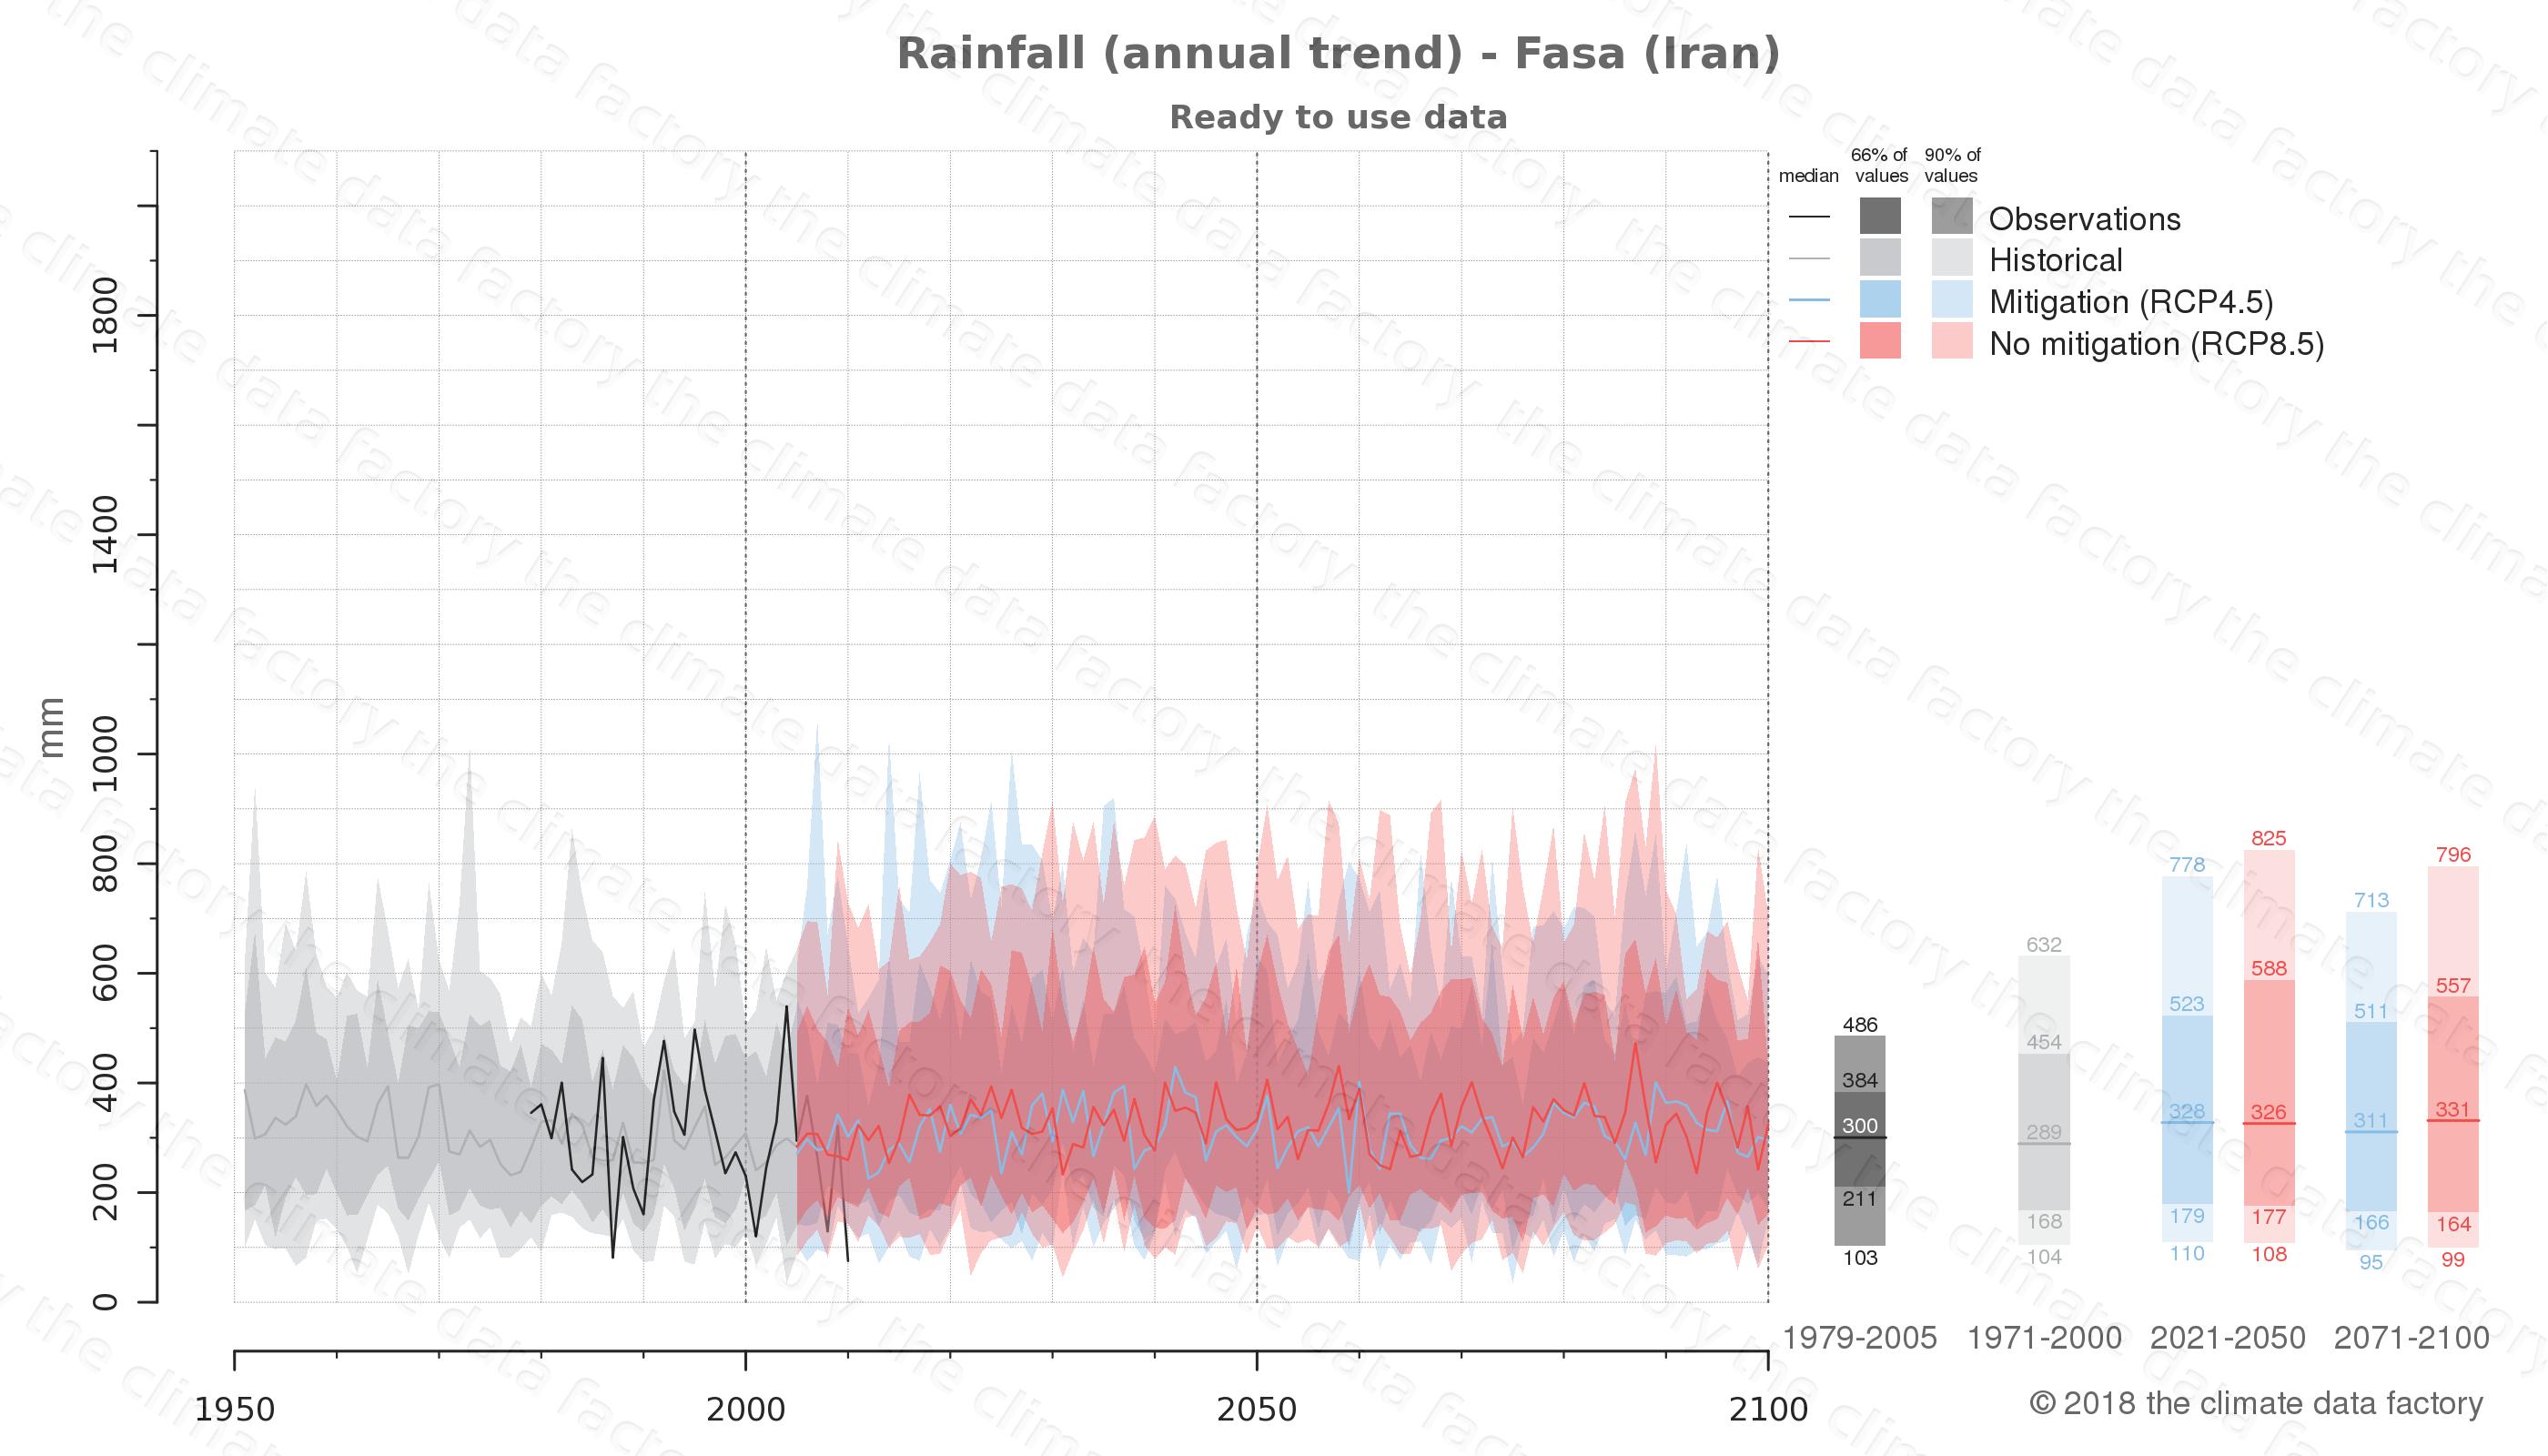 climate change data policy adaptation climate graph city data rainfall fasa iran